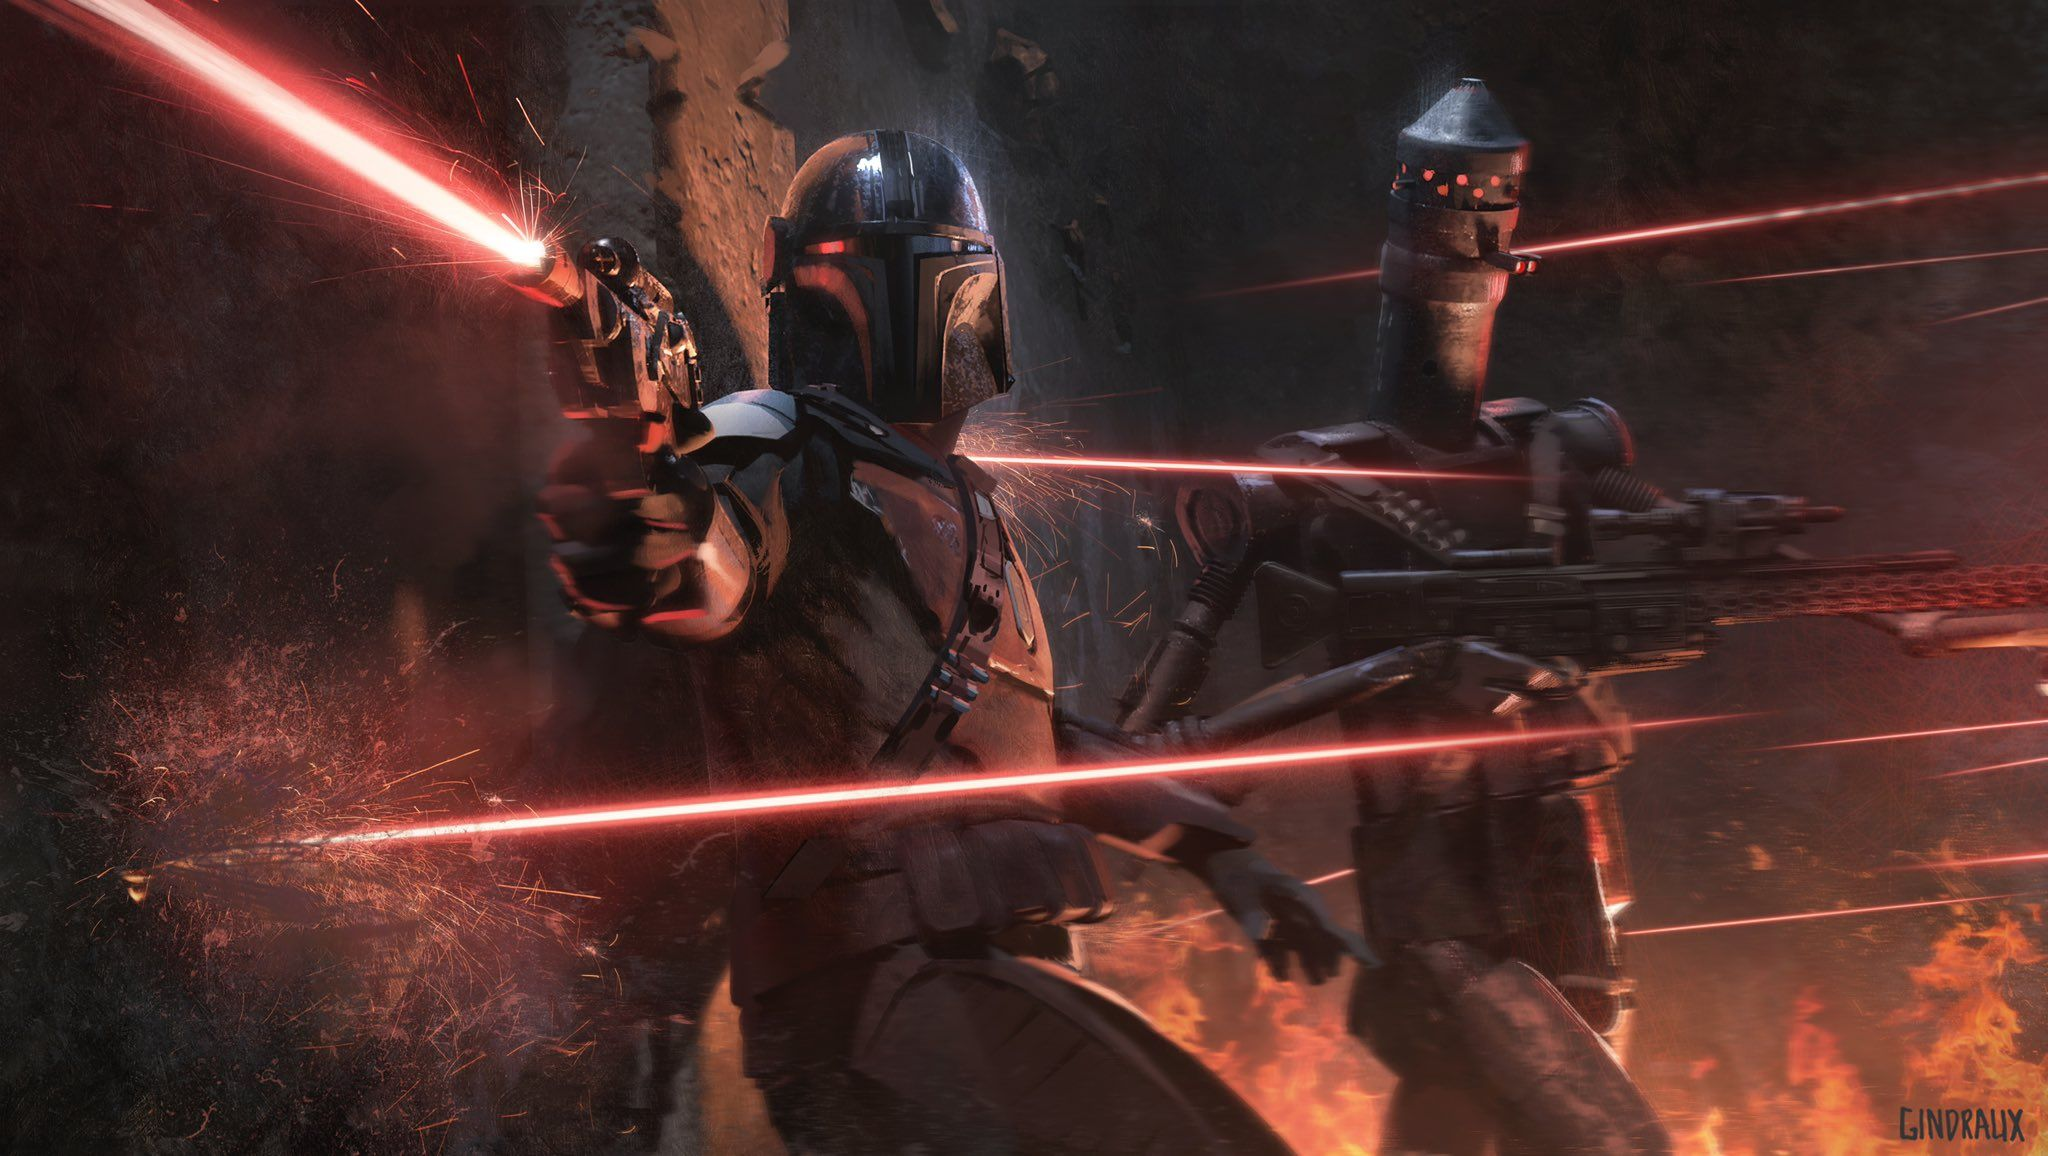 The Mandalorian On Star Wars Art Mandalorian Concept Art